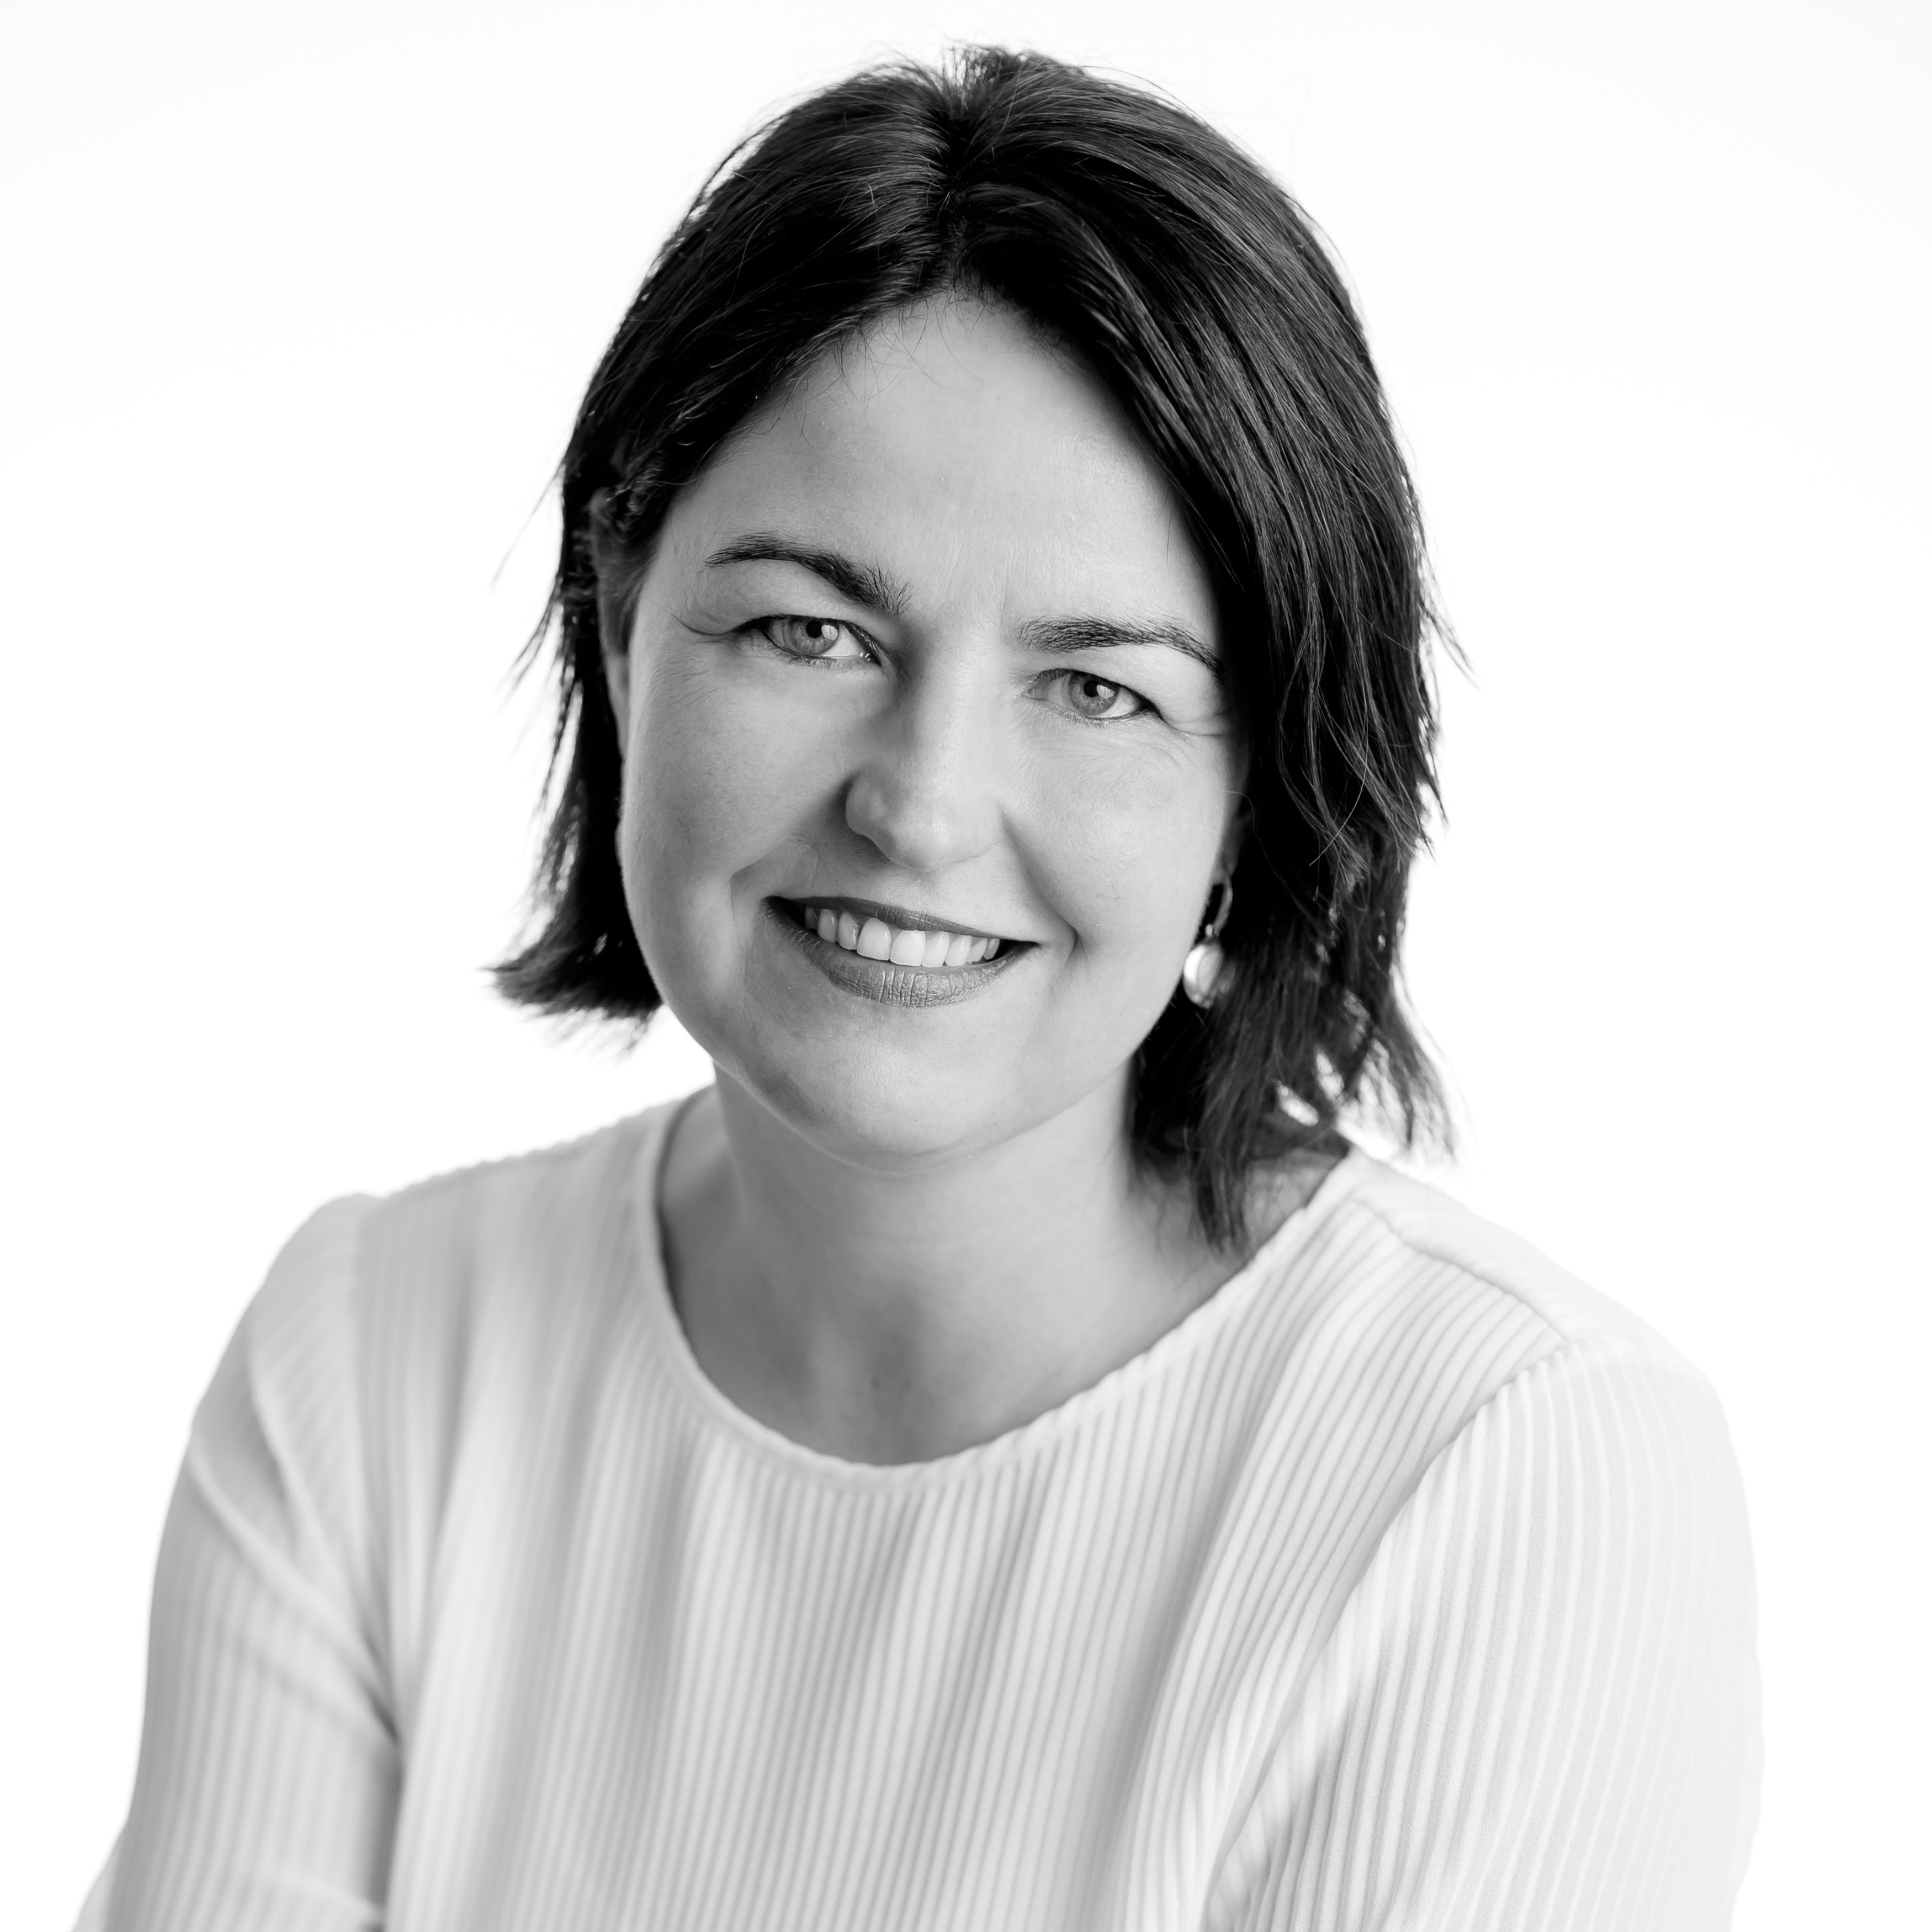 Esther Borre-Nijland